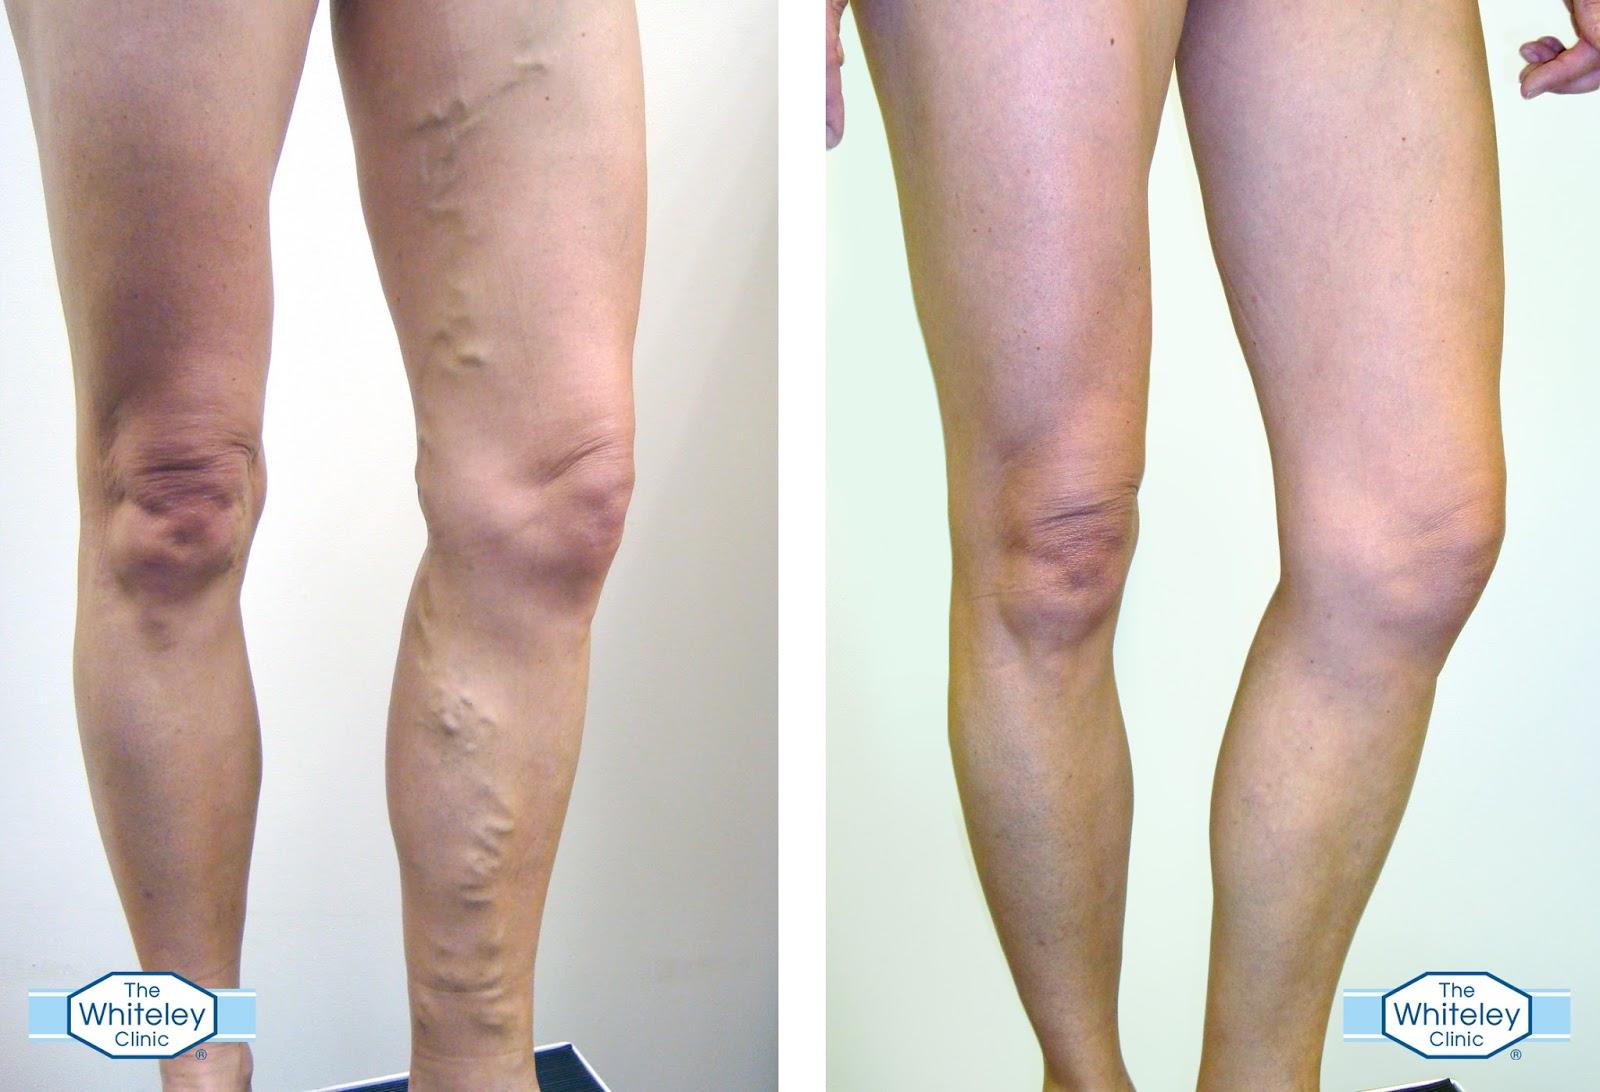 Prevention of varicose veins 27